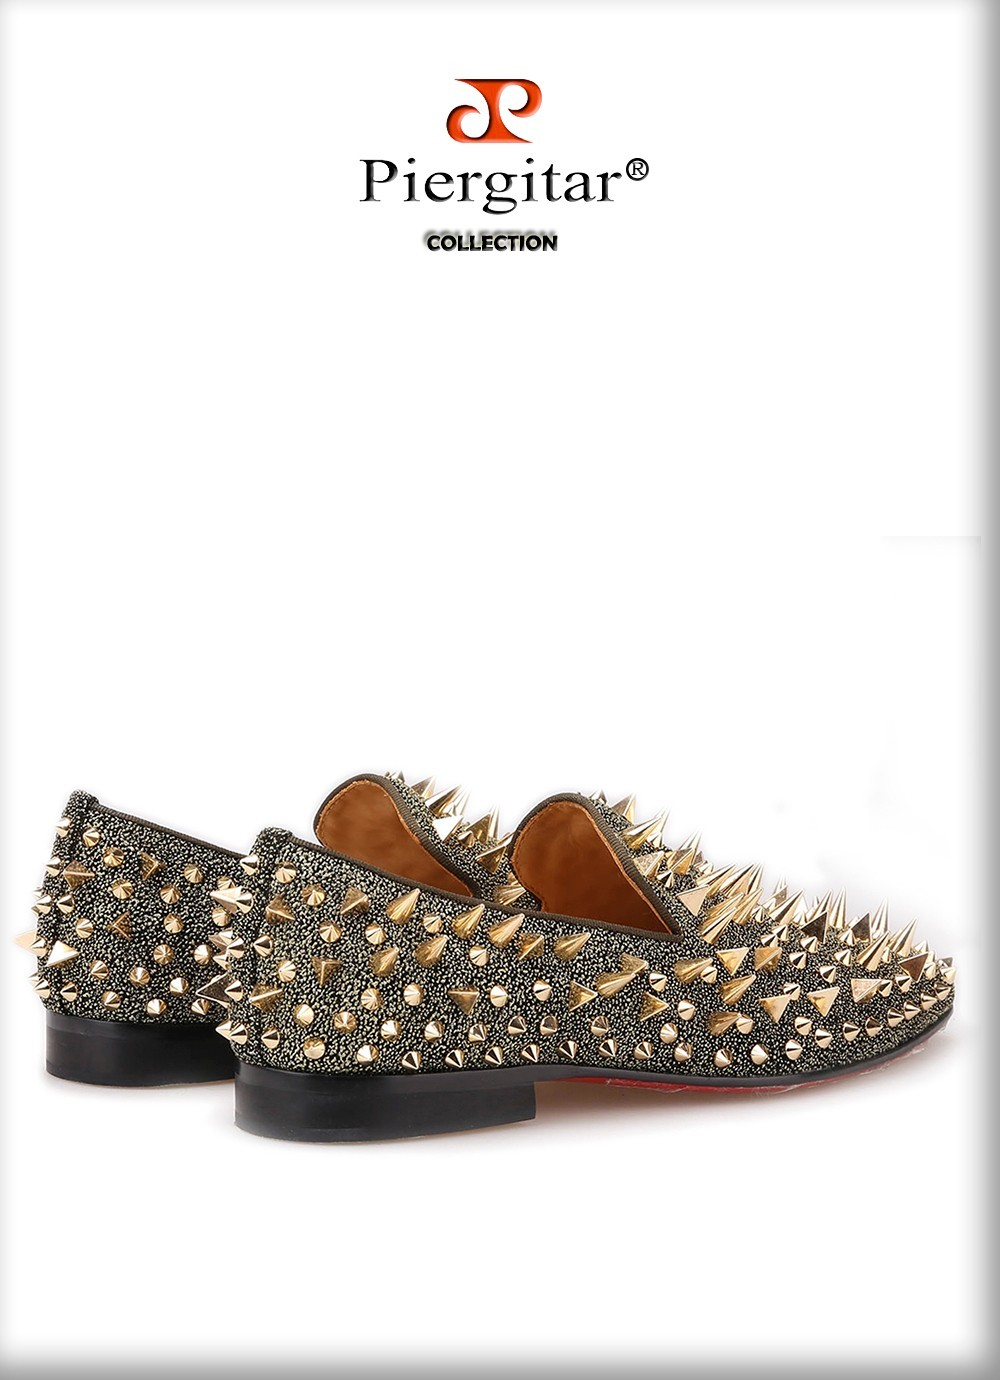 Exclusive Handmade Piergitar Gold Rivets Men's Red Bottom Luxury Fashion Shoes!